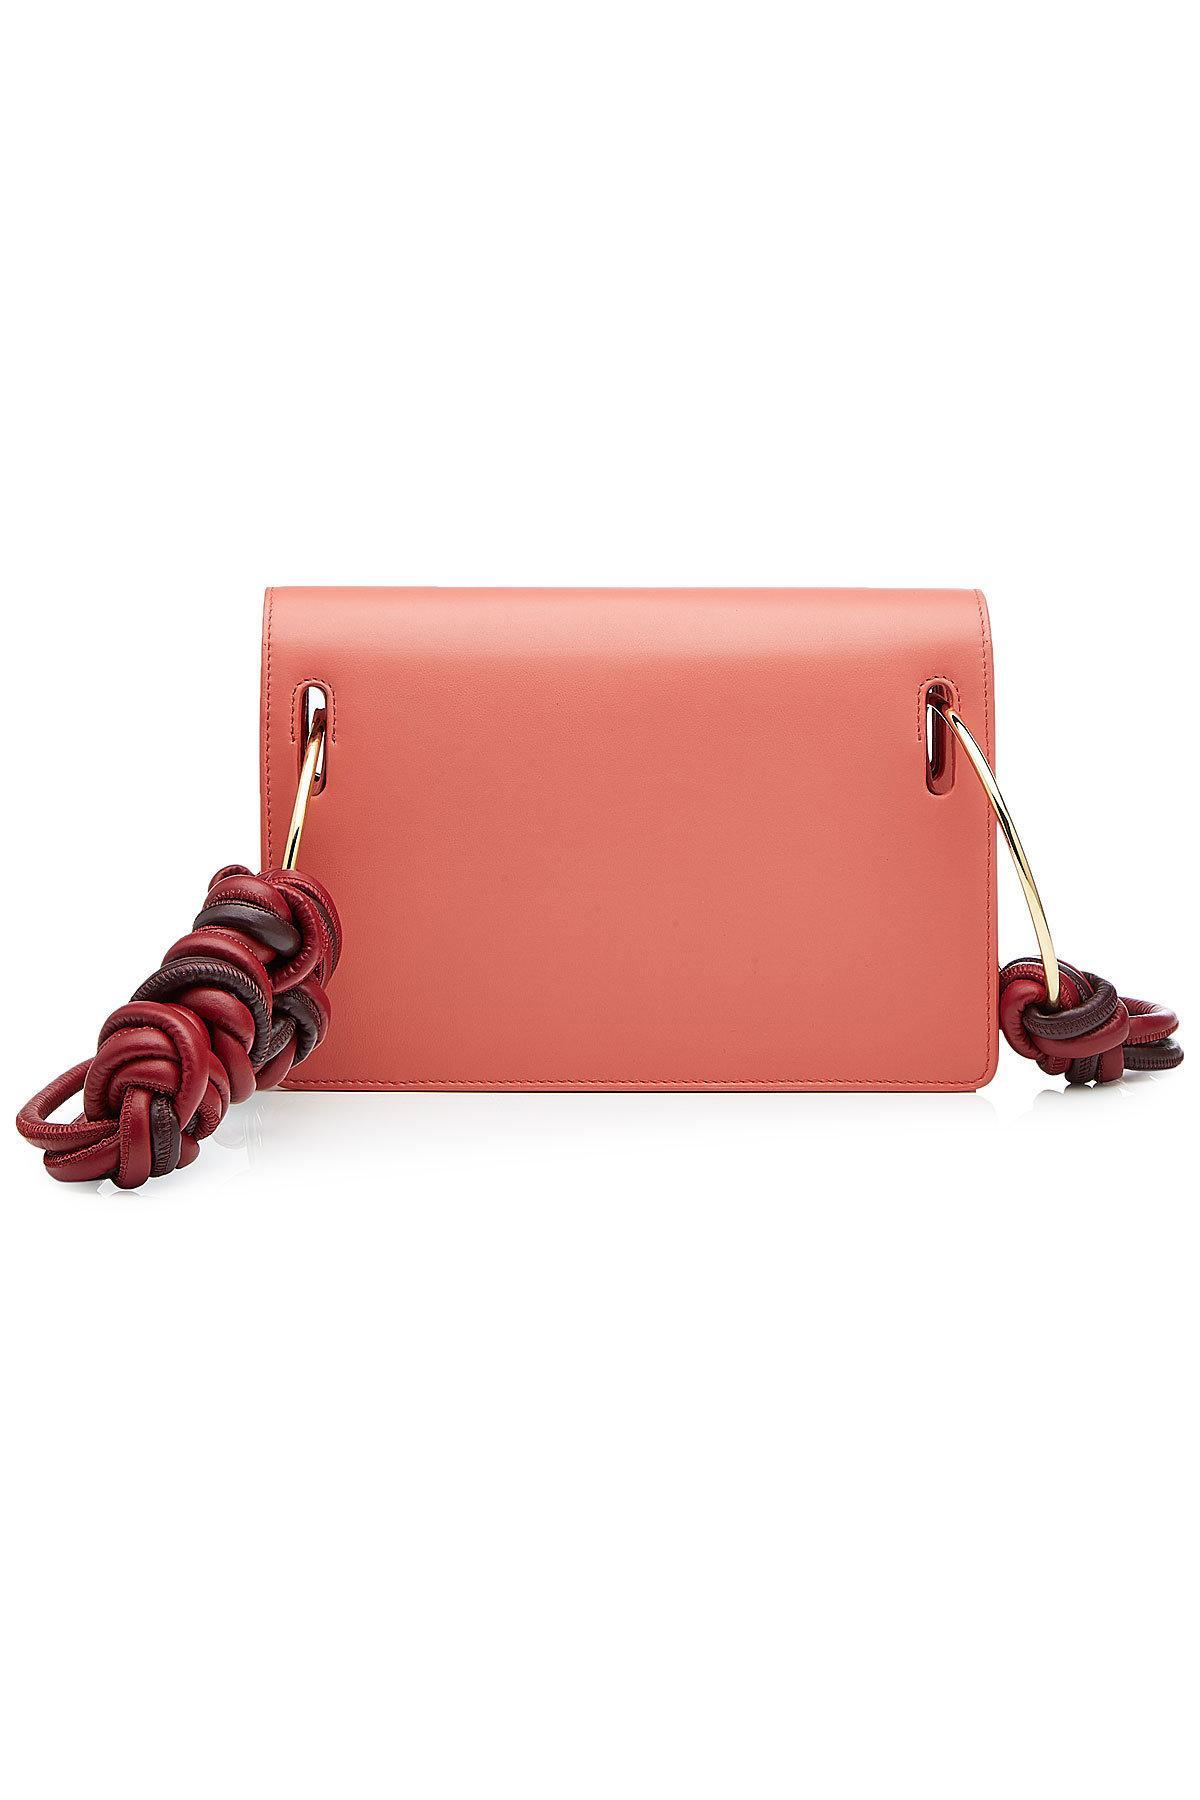 Roksanda Orchid Leather Dia Shoulder Bag In Red